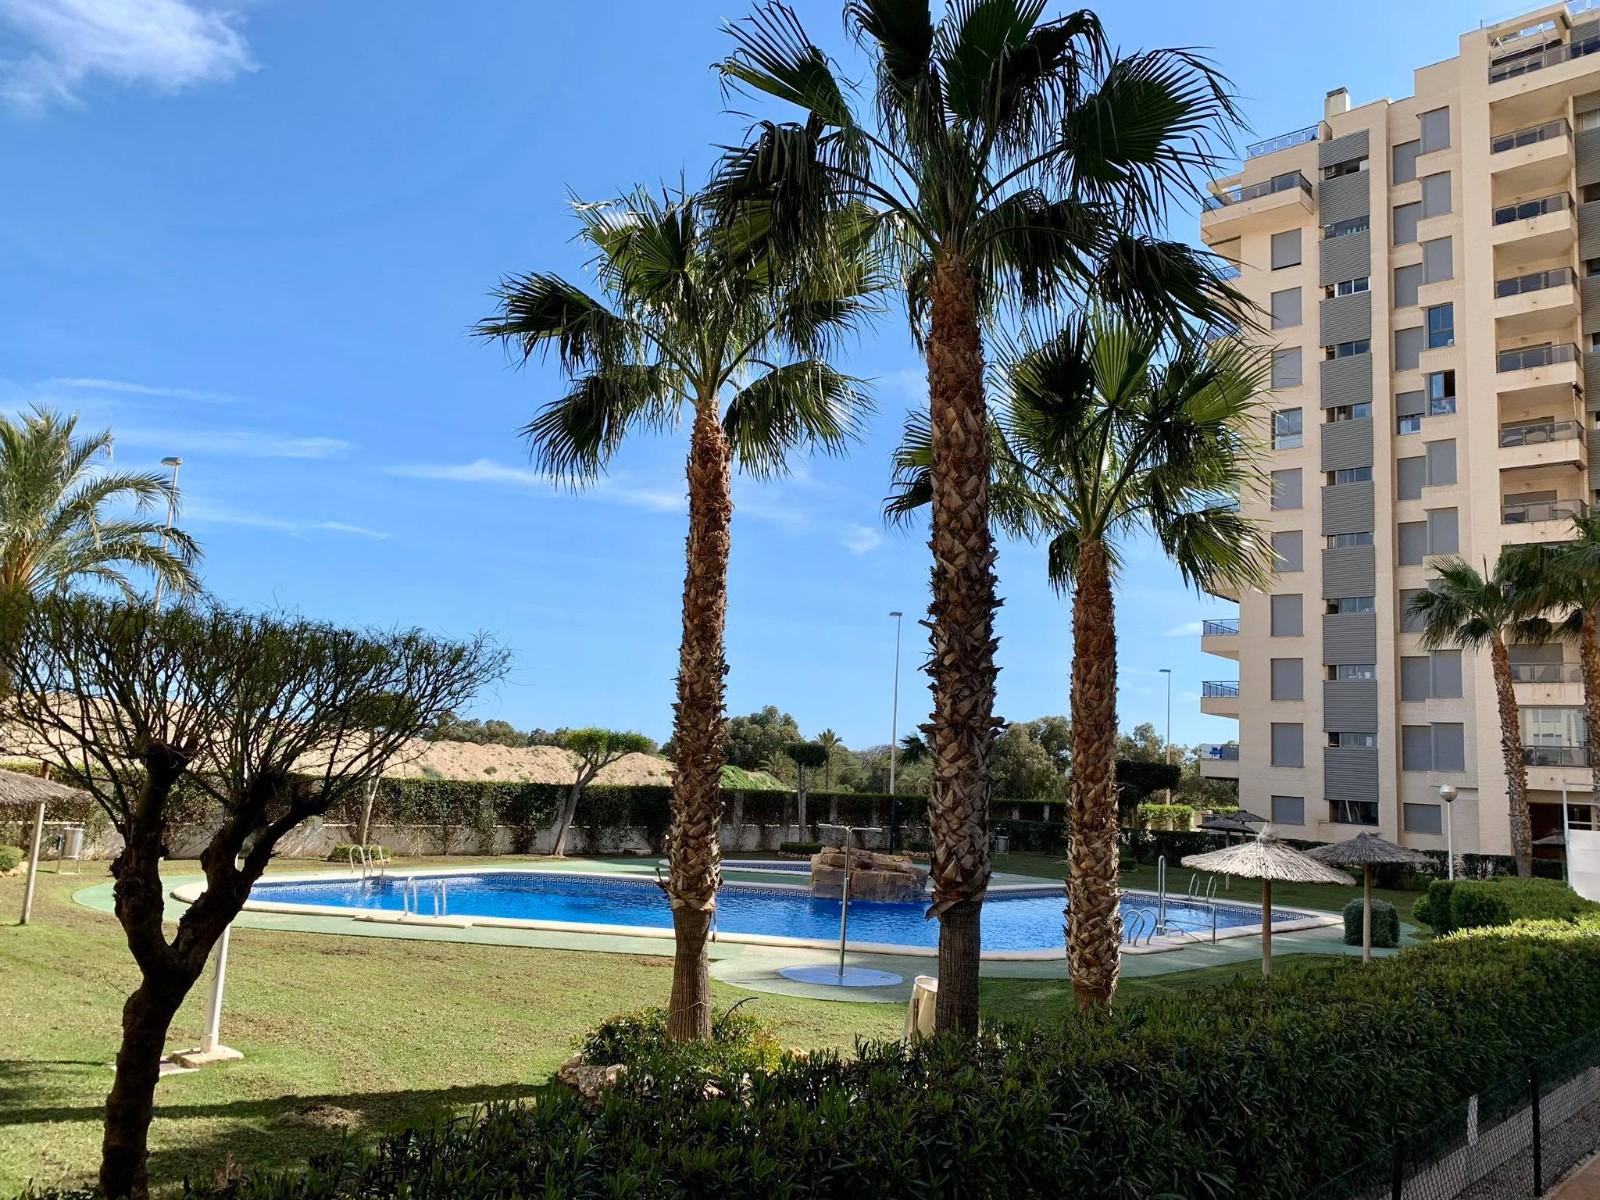 1 bedroom apartment / flat for sale in Guardamar del Segura, Costa Blanca